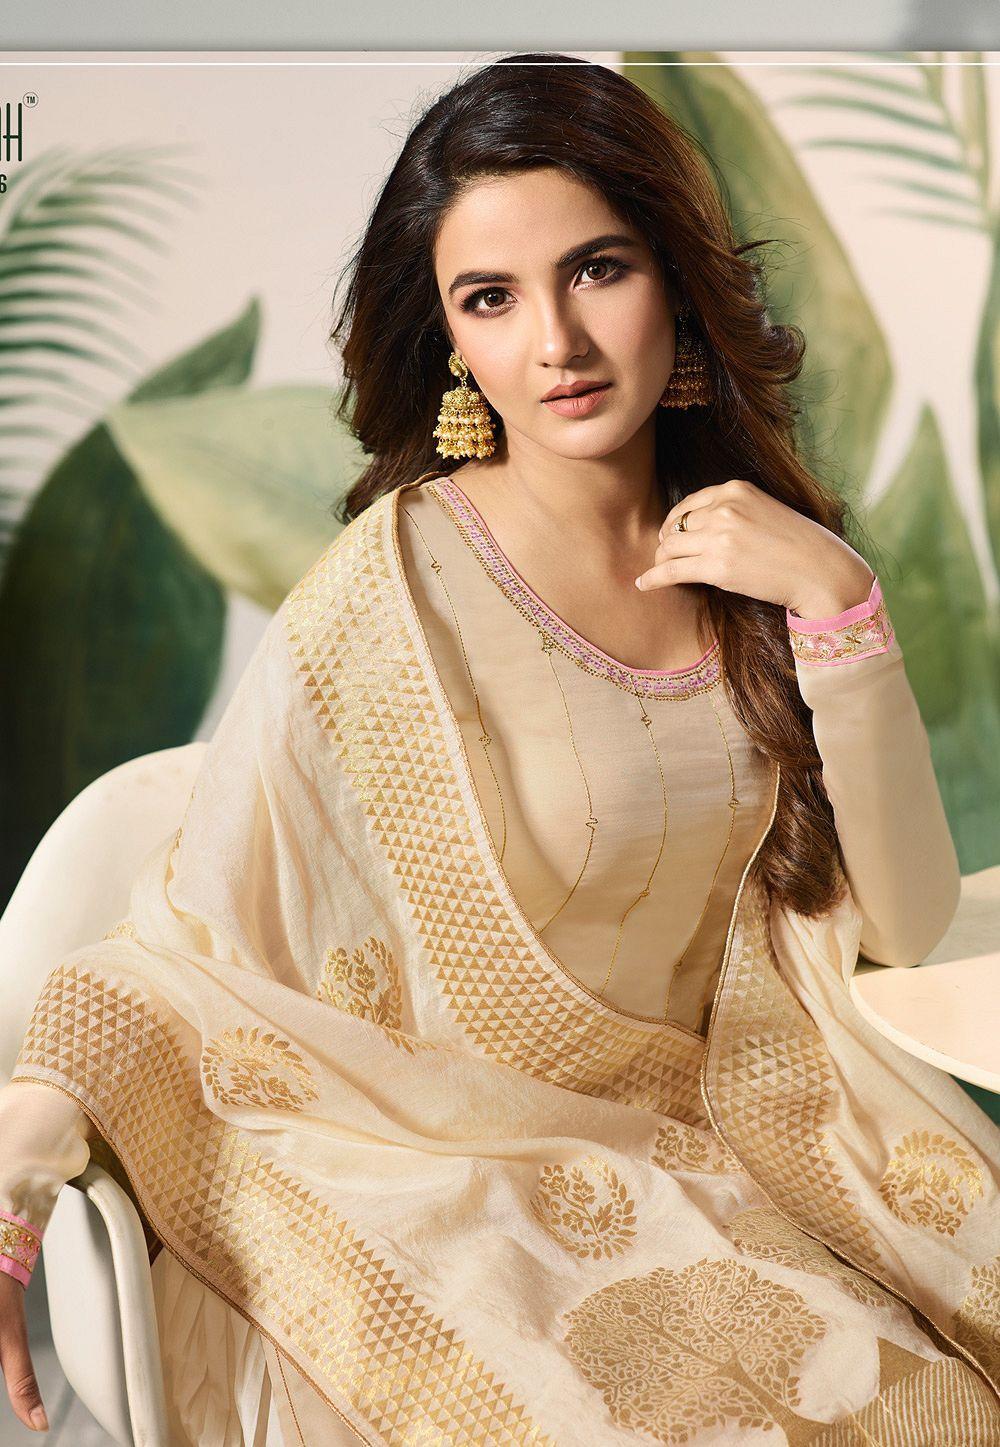 Cream satin silk sharara style pakistani suit 12006 in 2020 | Palazzo suit, Cream color dress ...